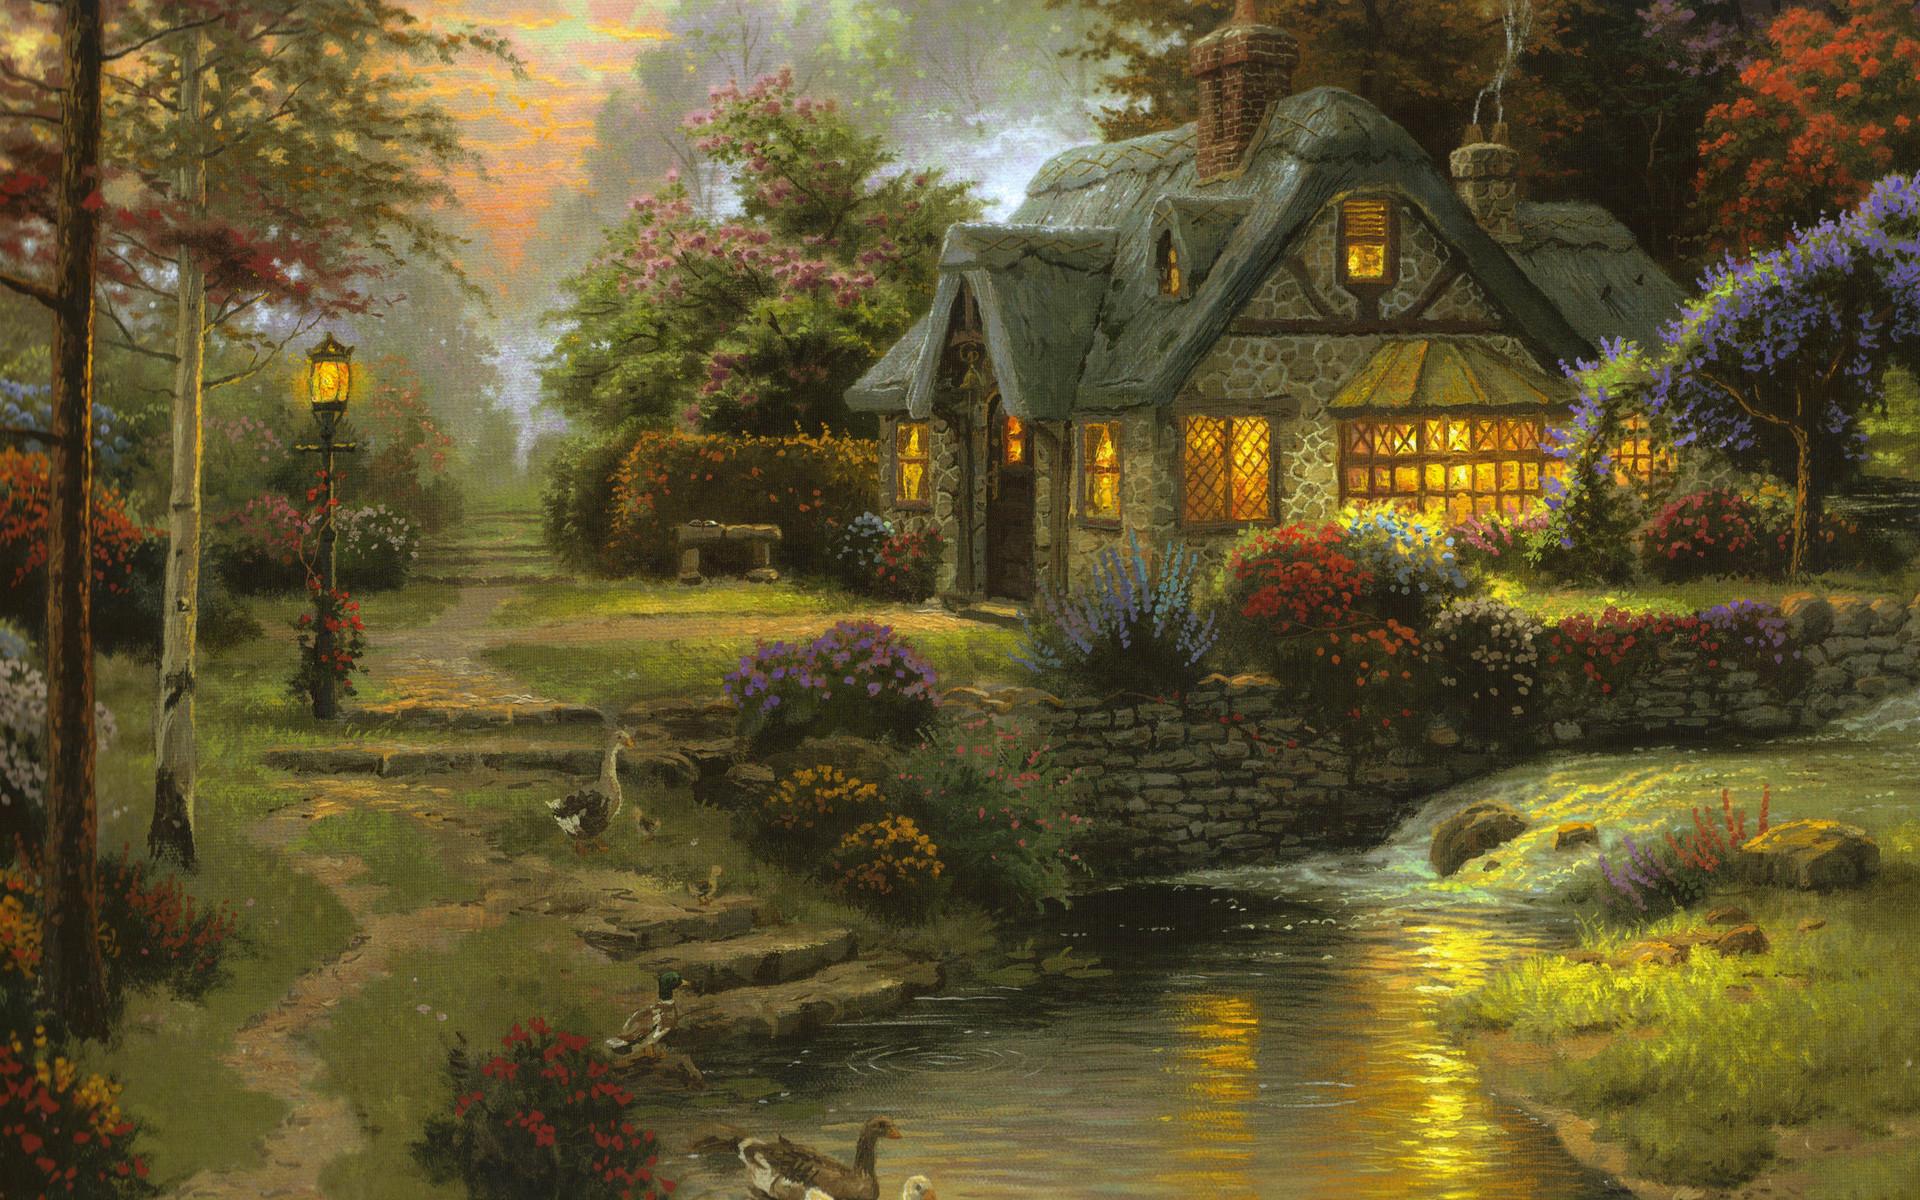 wallpaper-stillwater-cottage-thomas-kinkade-painting-art